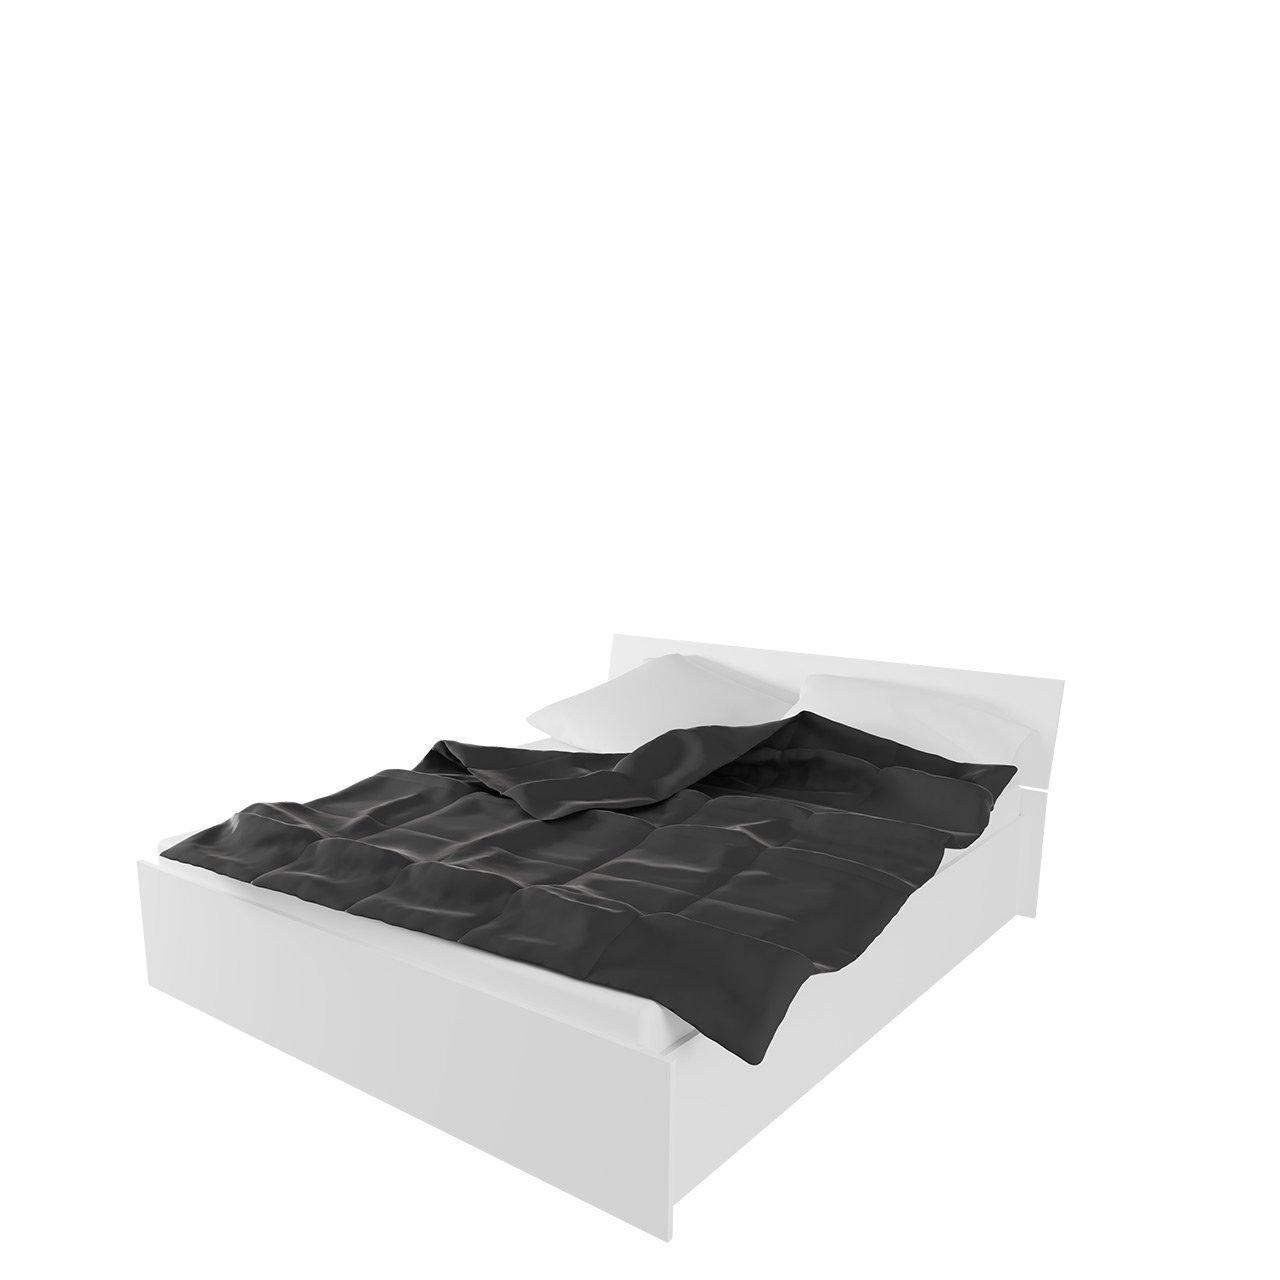 Penelopa P5 160 ágy